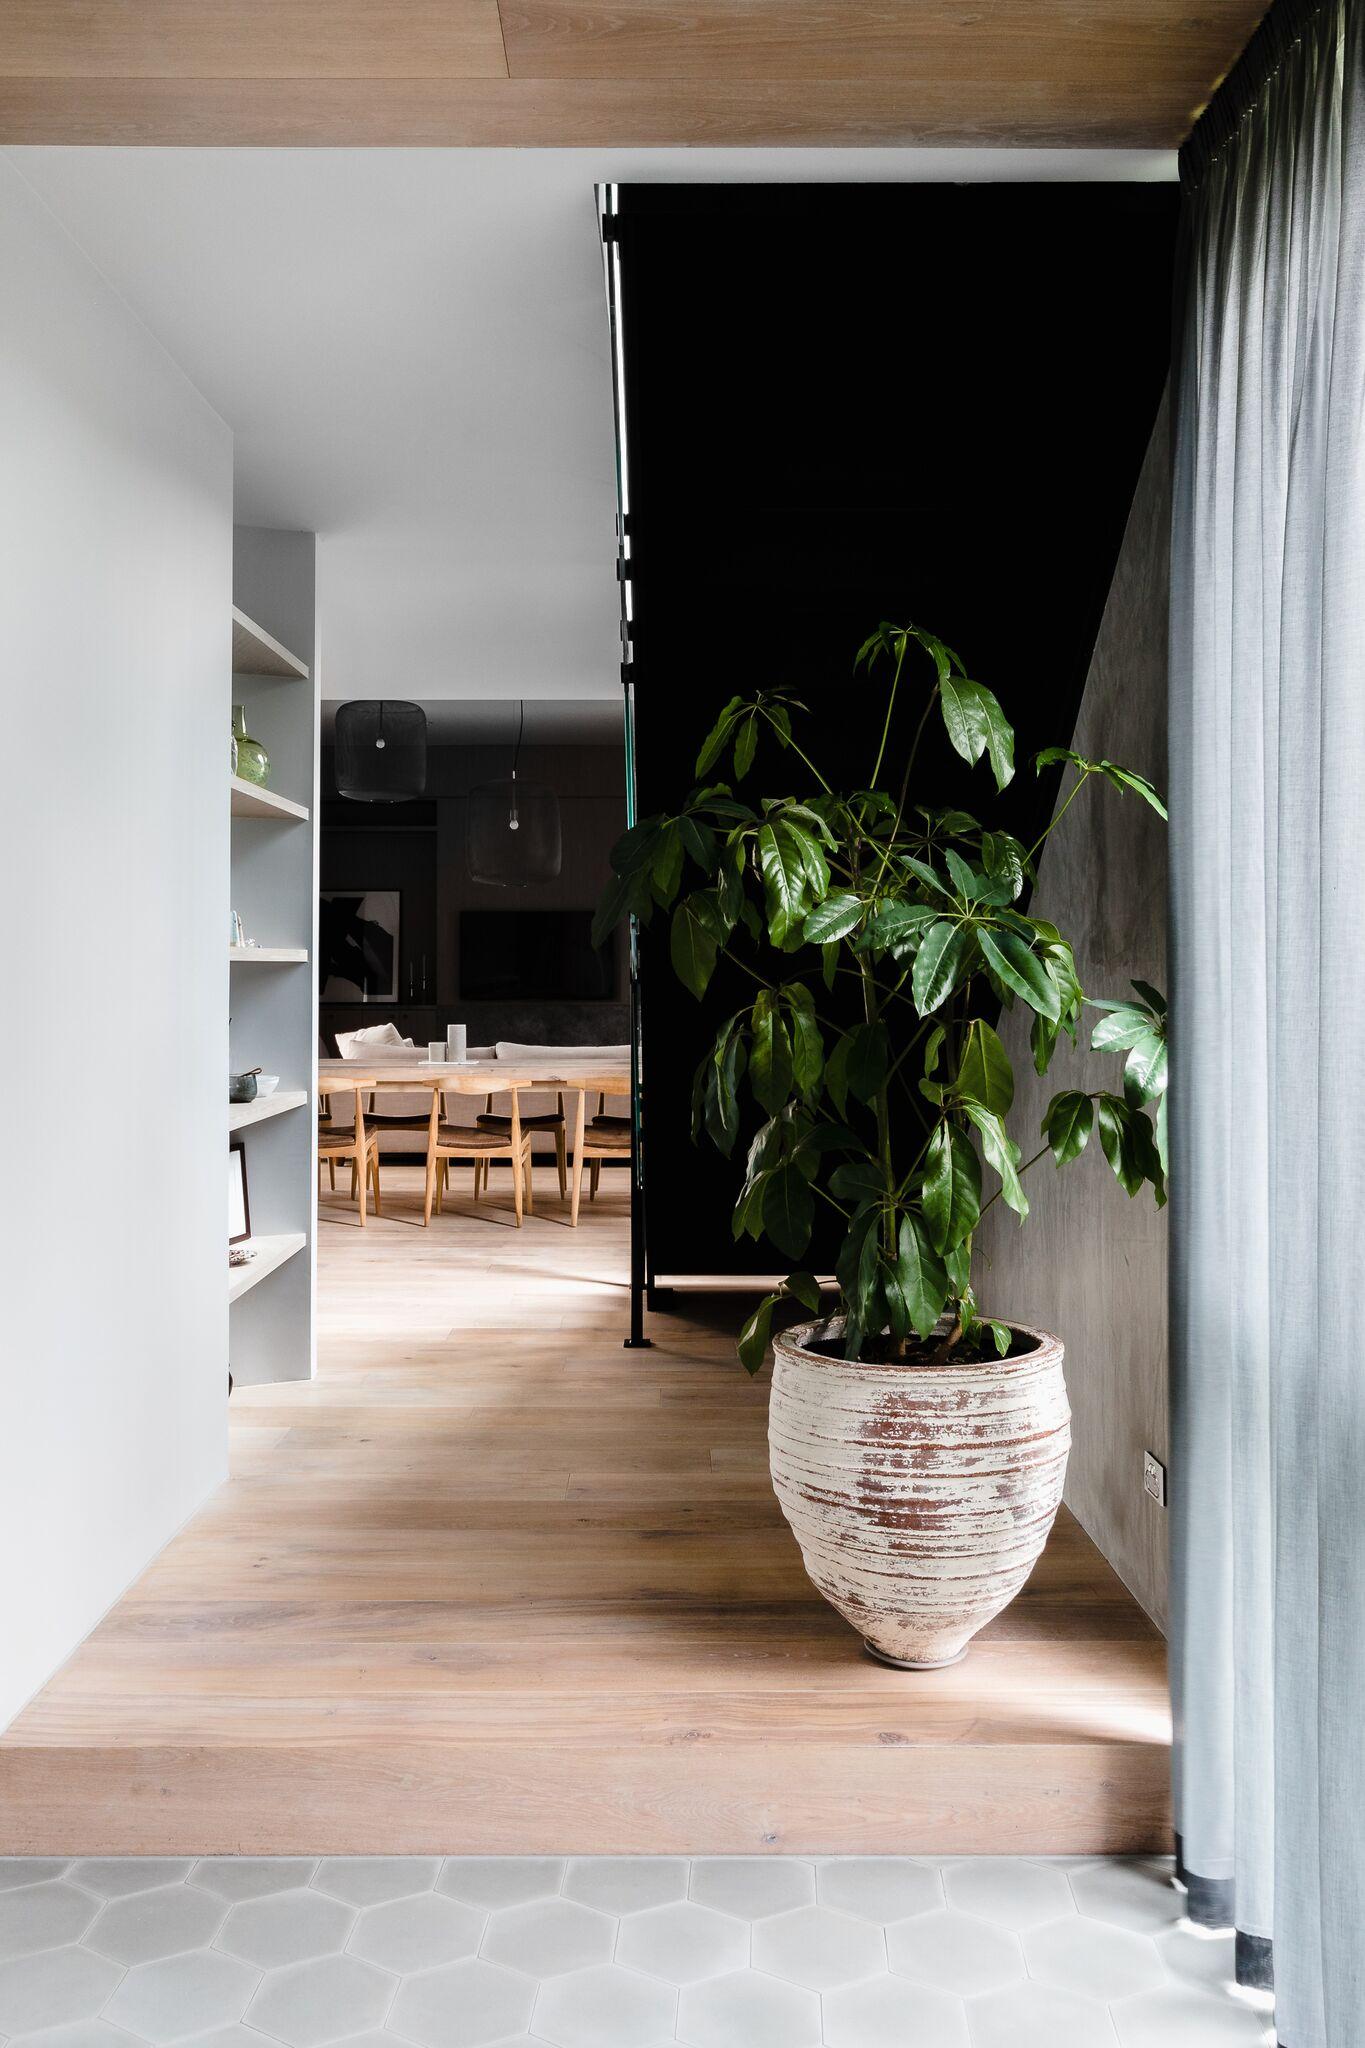 Gallery Of Balwyn Home By Studio Ezra Local Australian Interior Architecture Balwyn, Melbourne Image 6